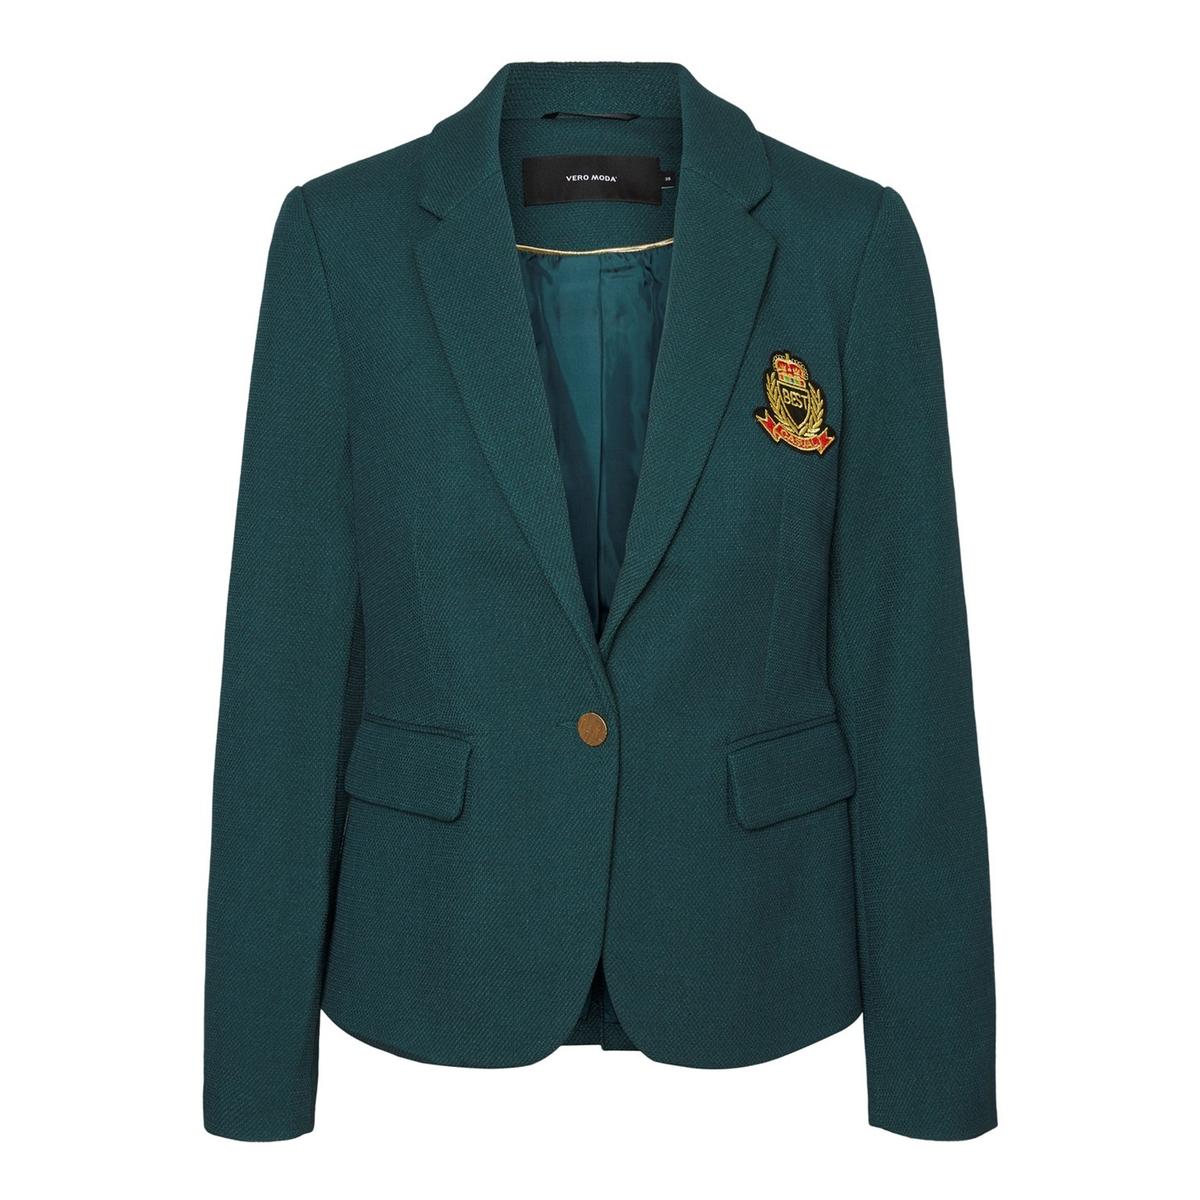 цена Жакет-блейзер La Redoute La Redoute 34 (FR) - 40 (RUS) зеленый онлайн в 2017 году